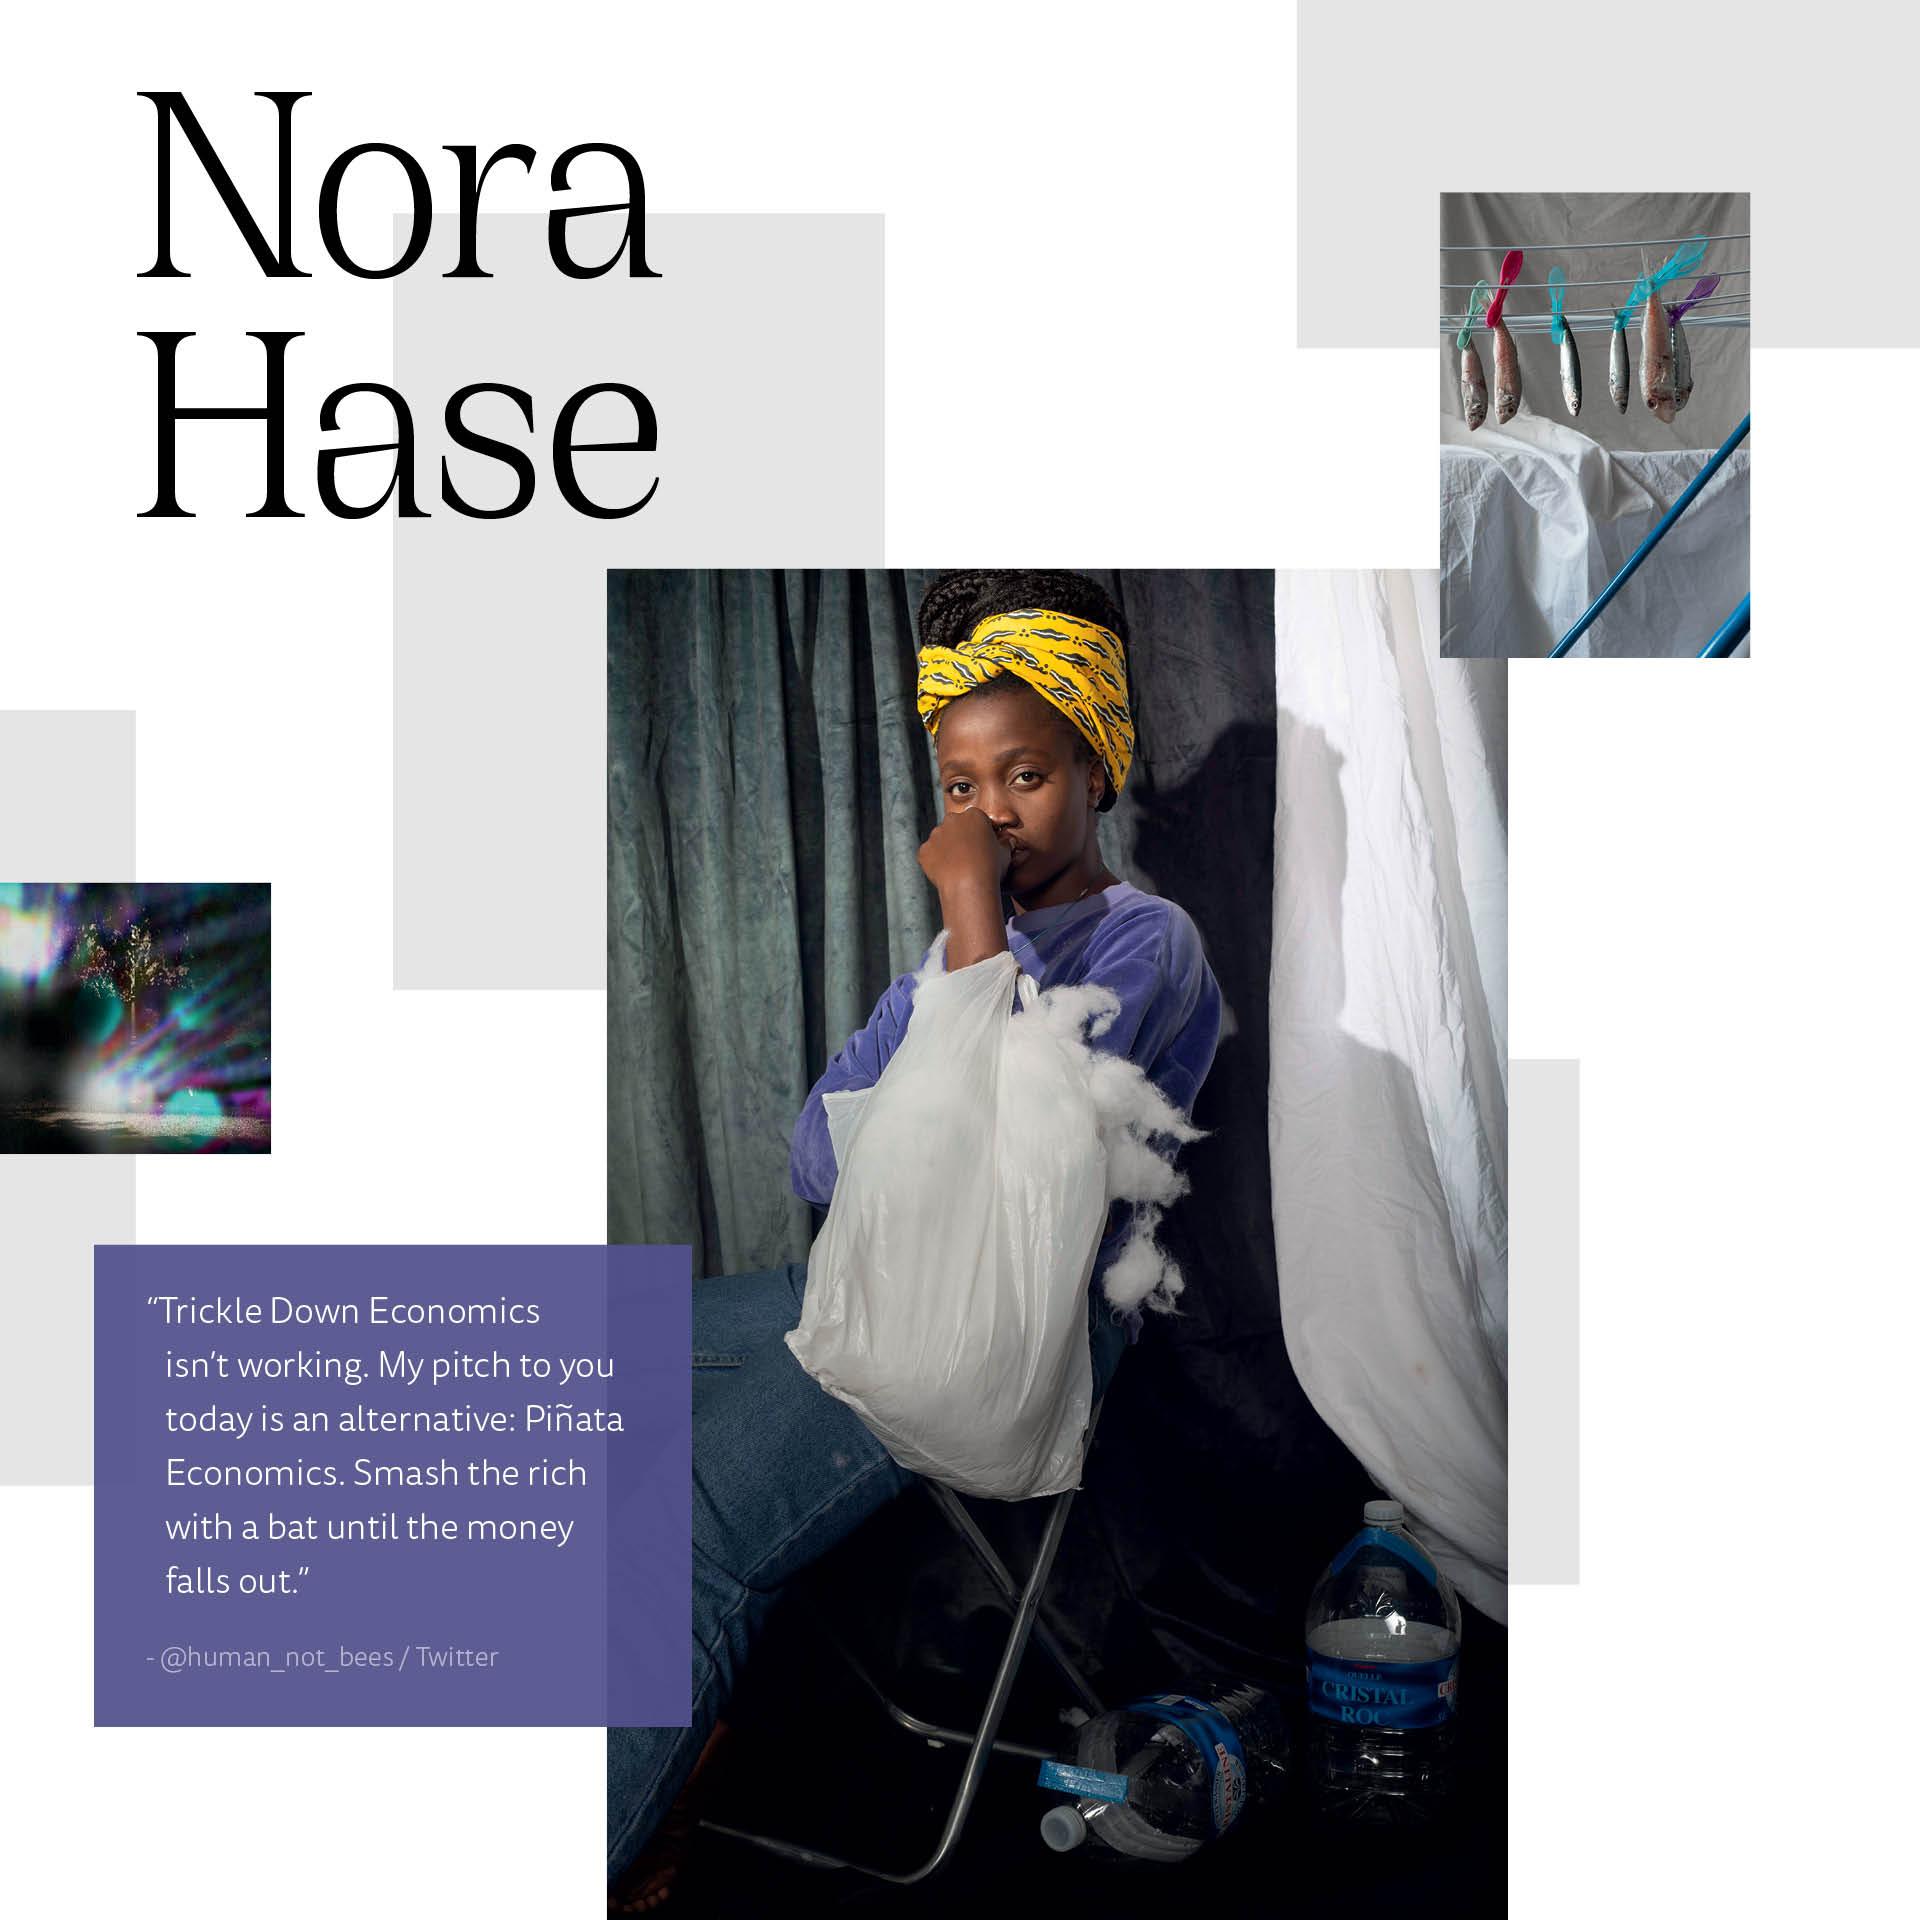 Beyond Artist Nora Hase